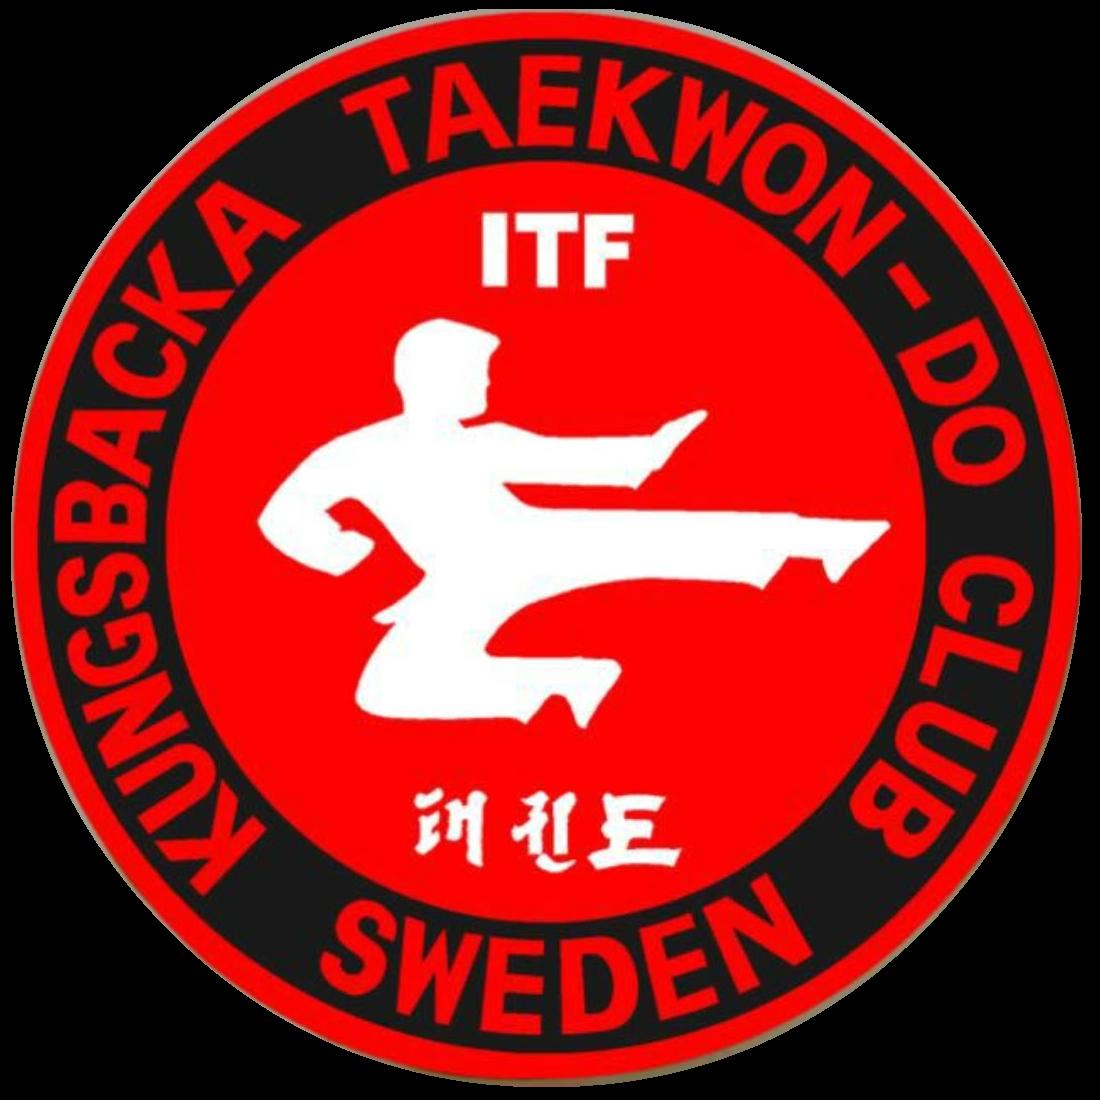 Kungsbacka taekwondo